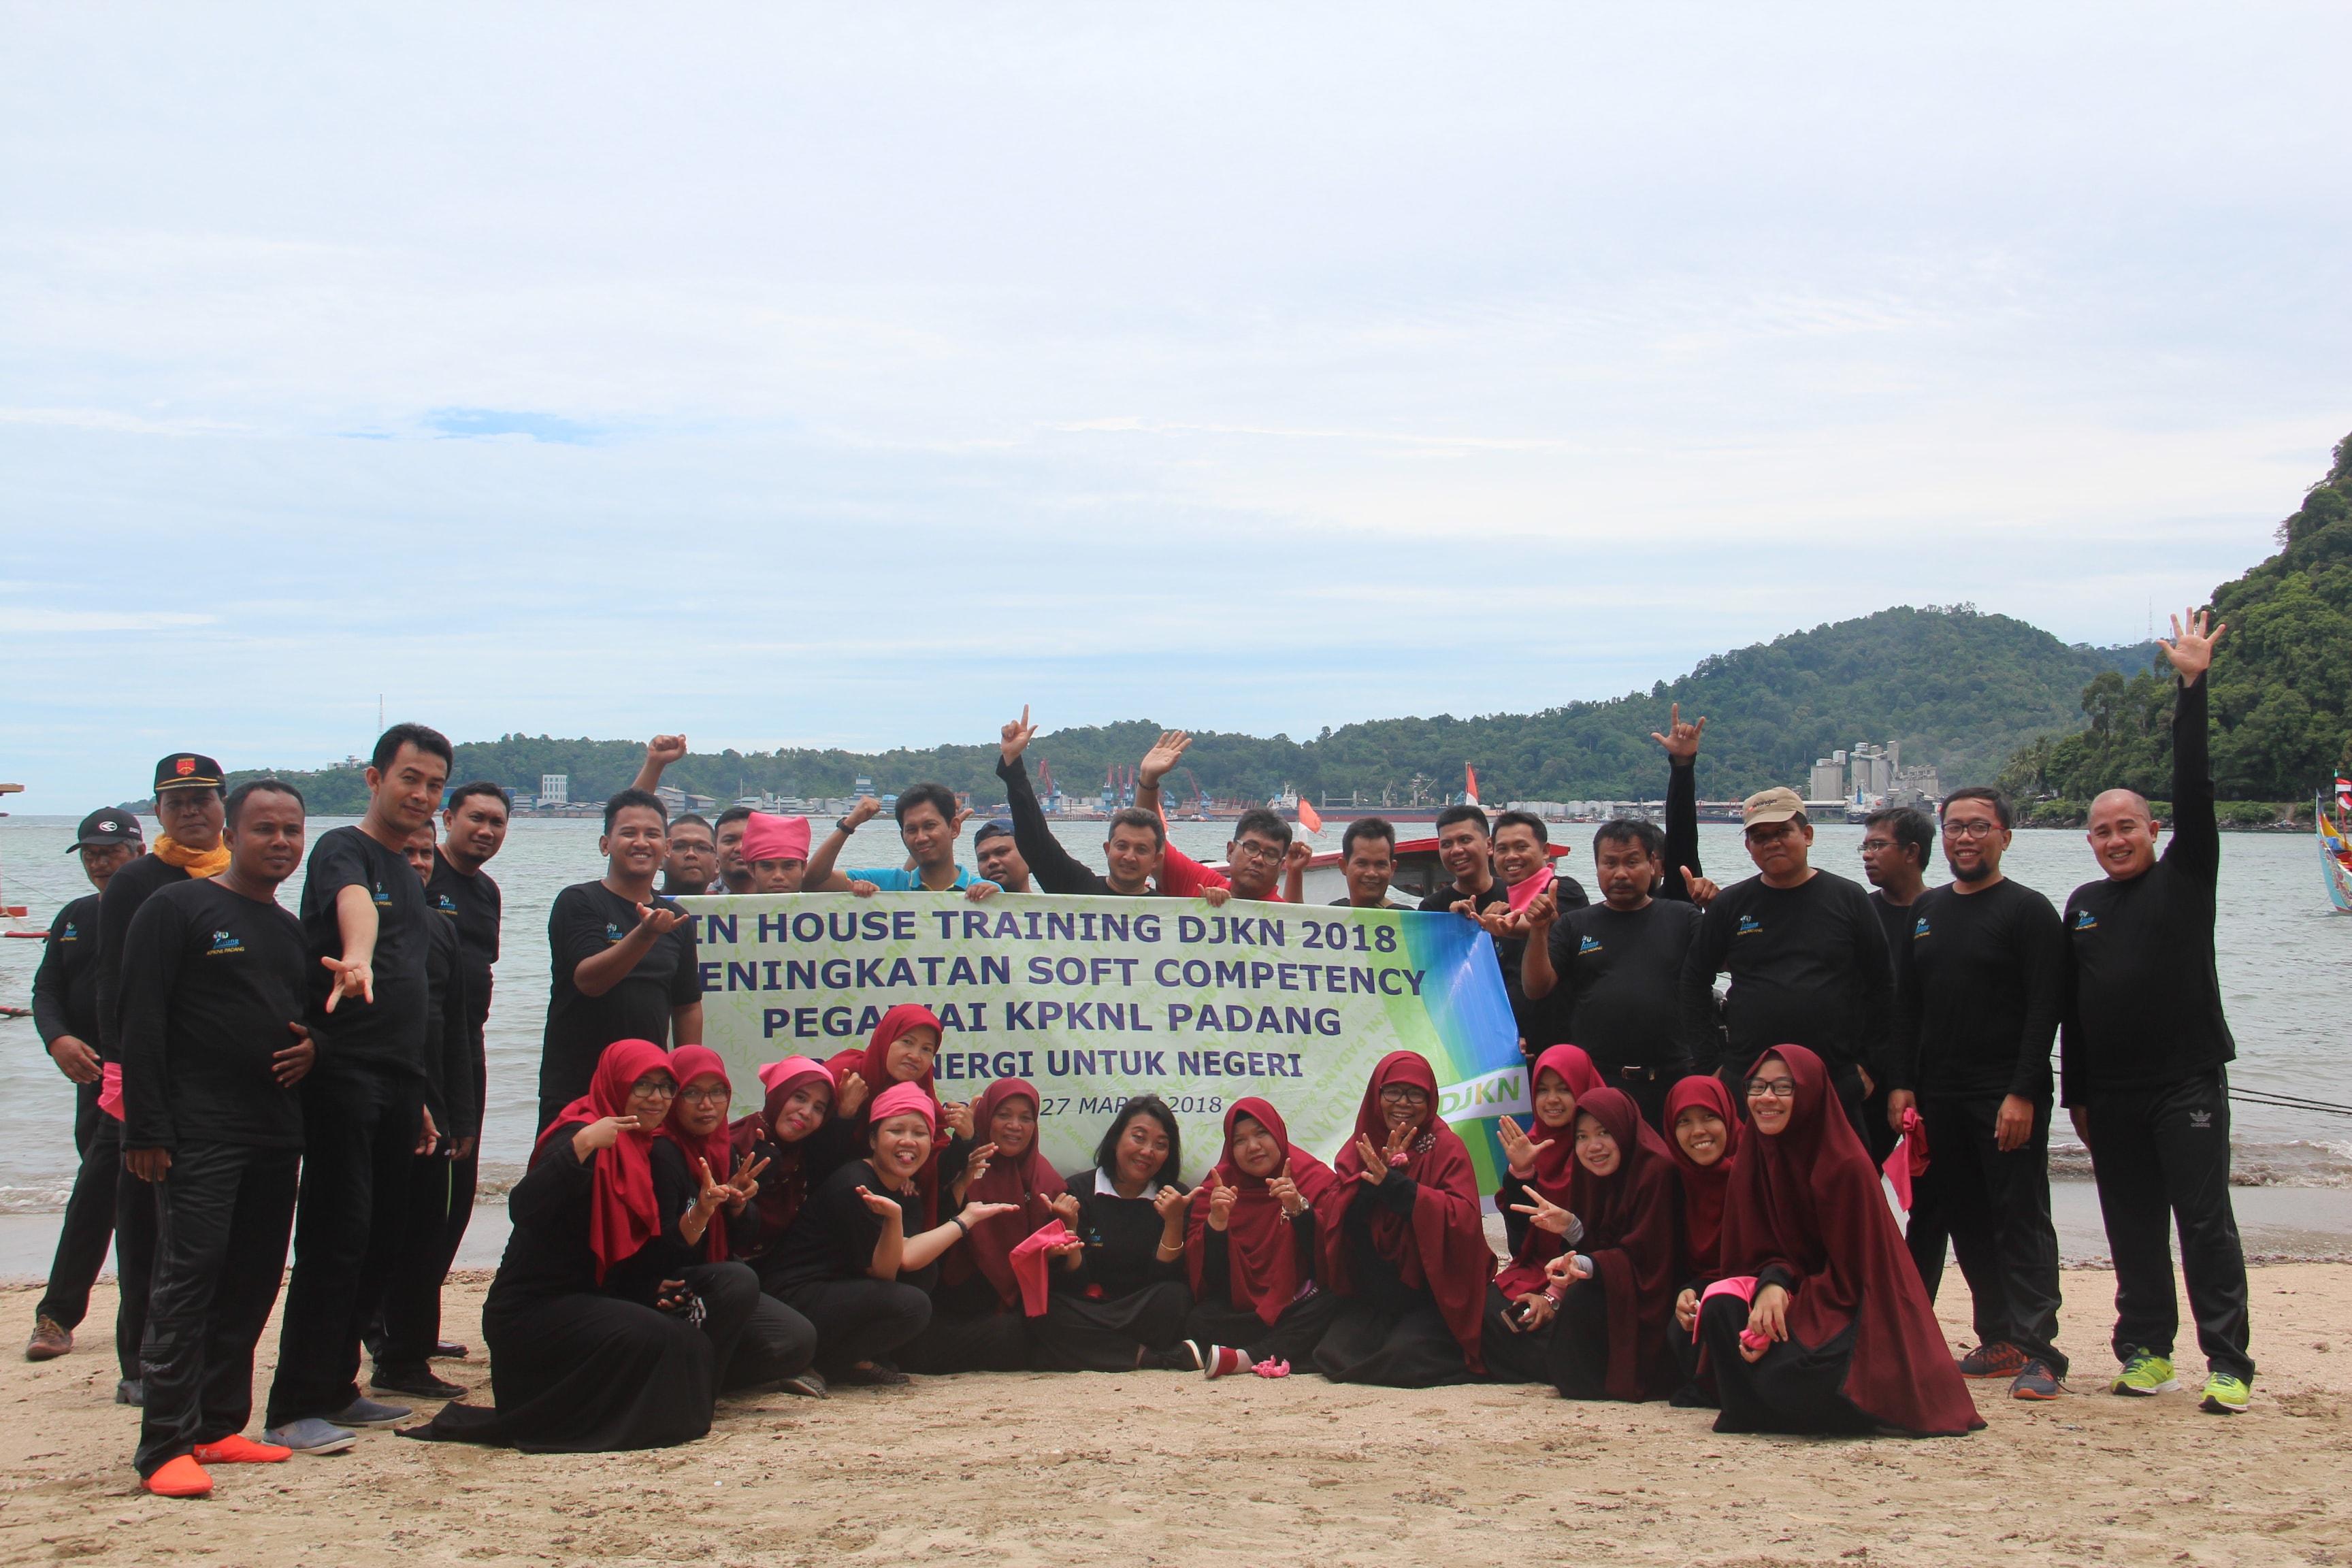 IHT Seru di Pinggir Pantai Bersama KPKNL Padang